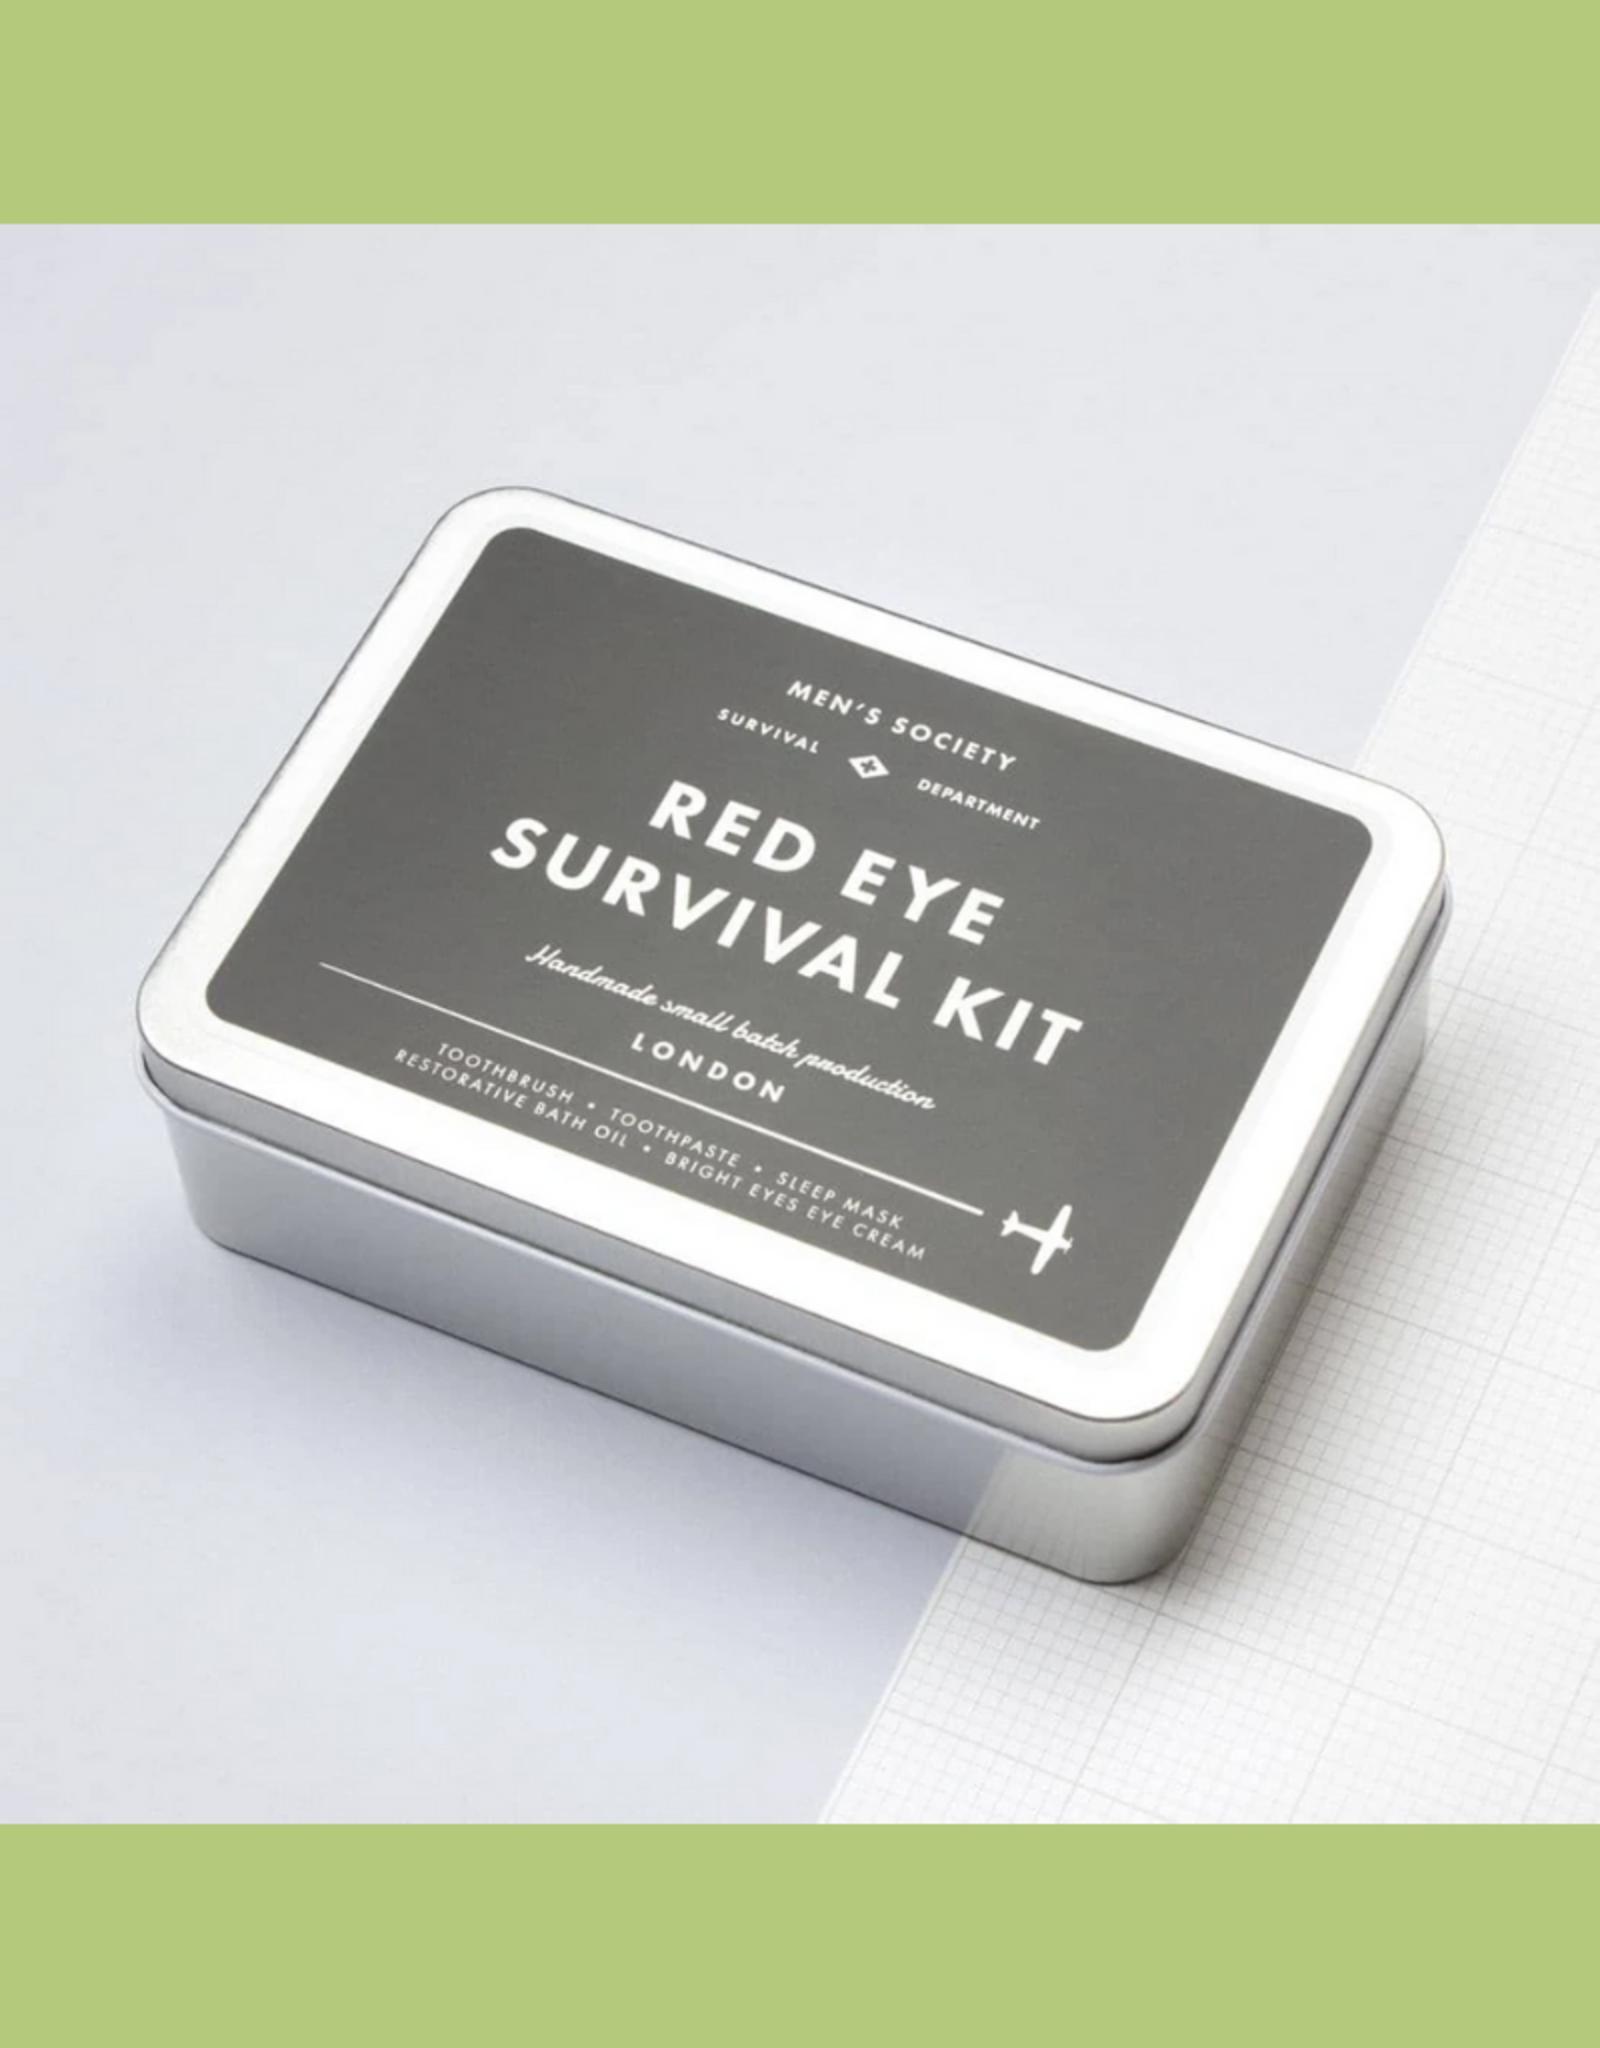 The Men's Society Red Eye Survival Kit